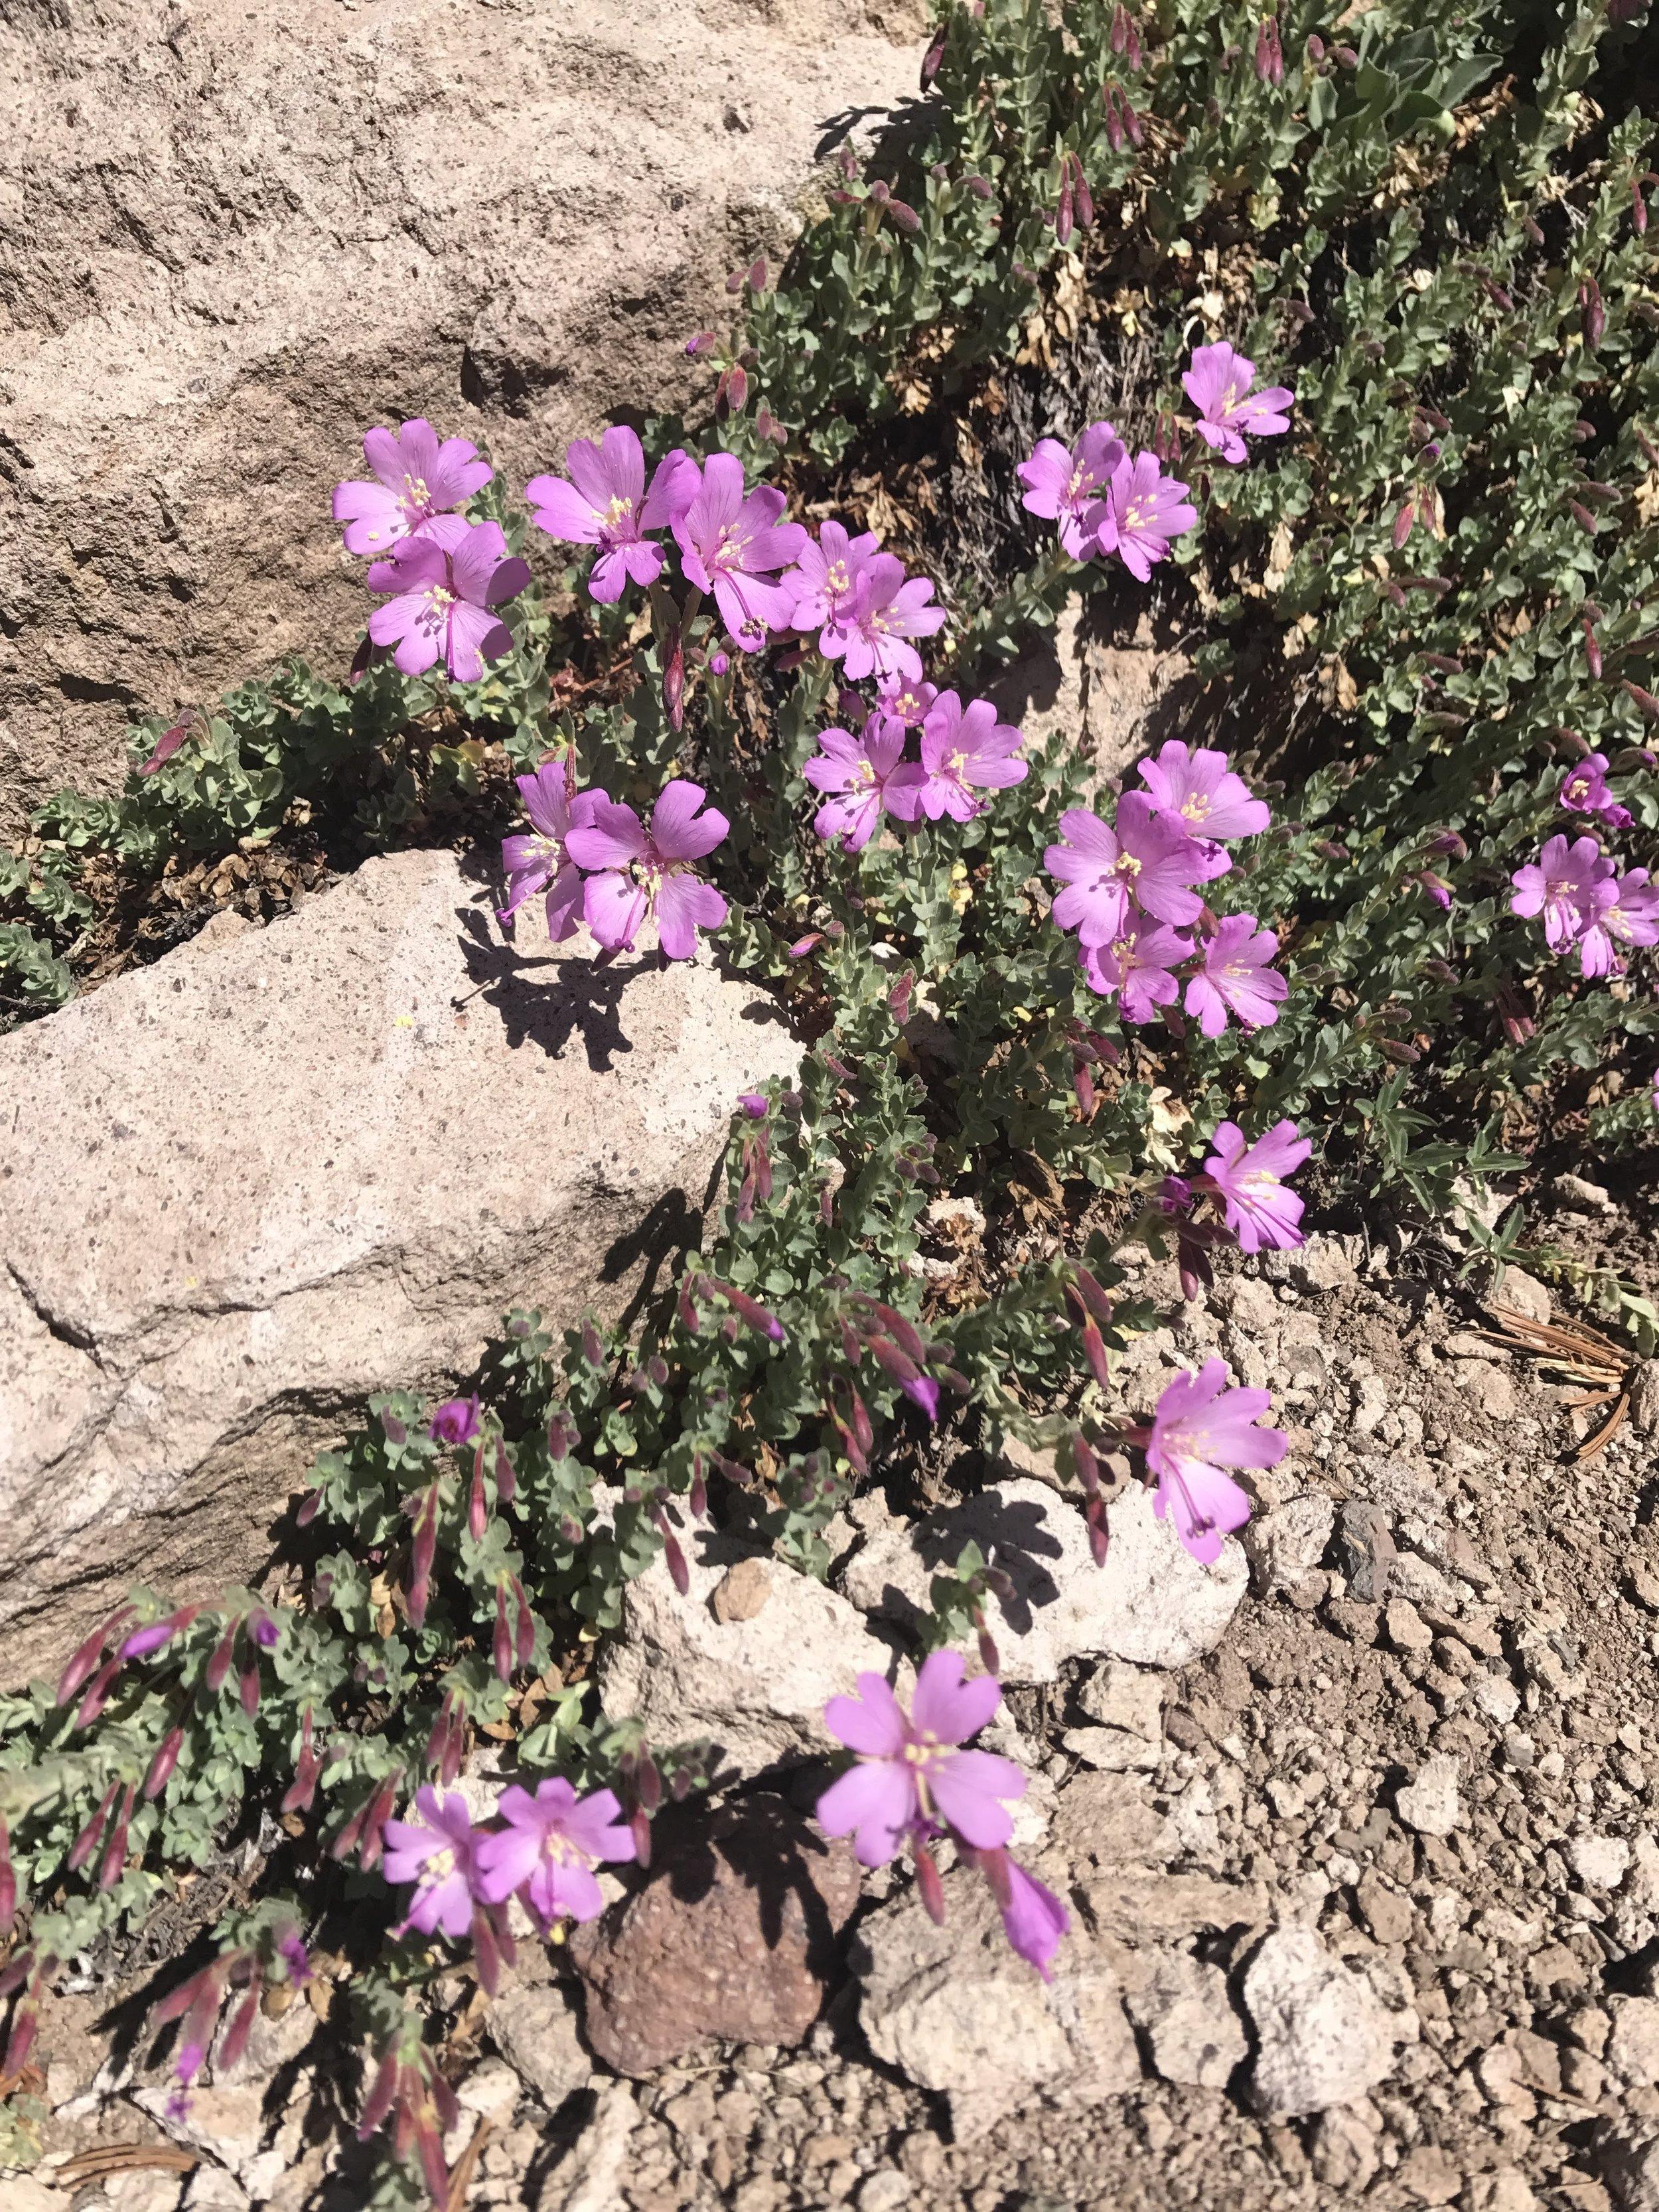 Beautiful pink wildflowers